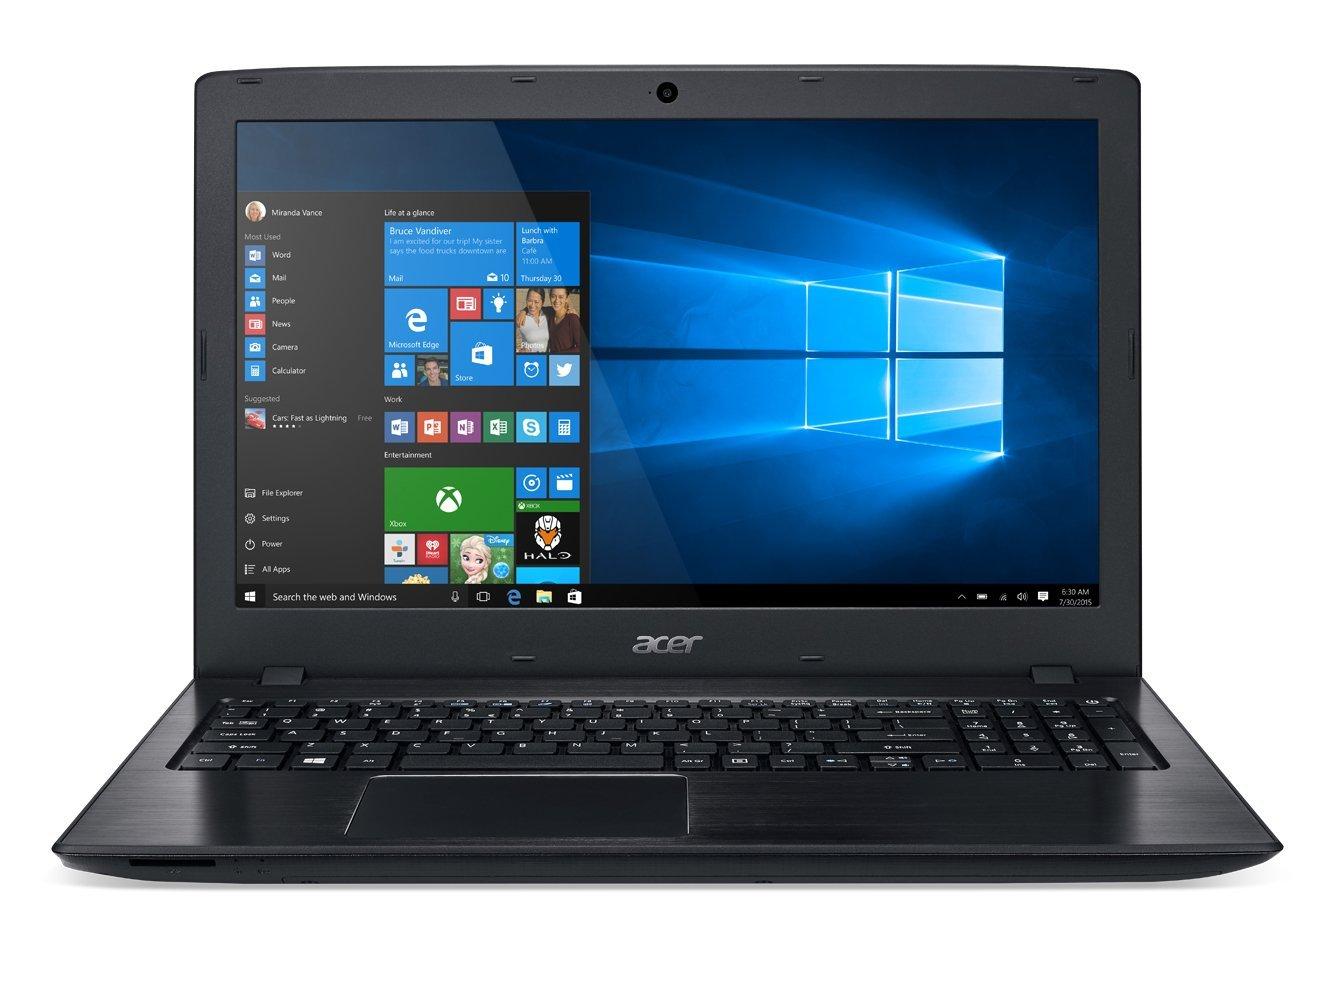 Acer Aspire E 15 Laptop Pre-Order: i5 6200U, 256GB SSD, Win 10  $550 + Free S/H